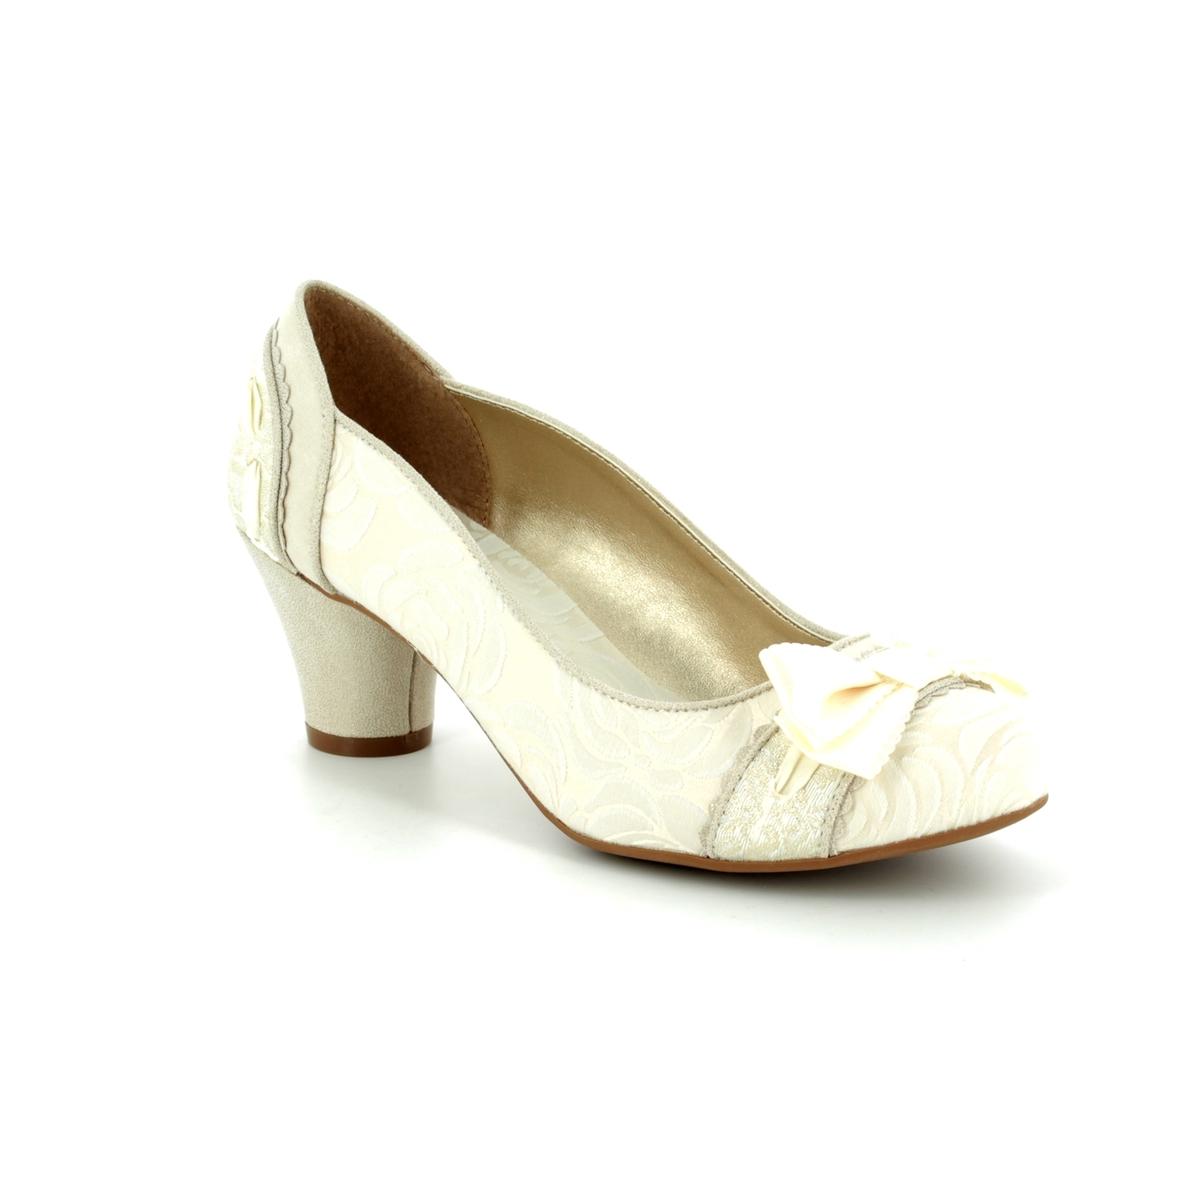 8ae89f4385232 Ruby Shoo Heeled Shoes - Cream - 09160/75 HAYLEY